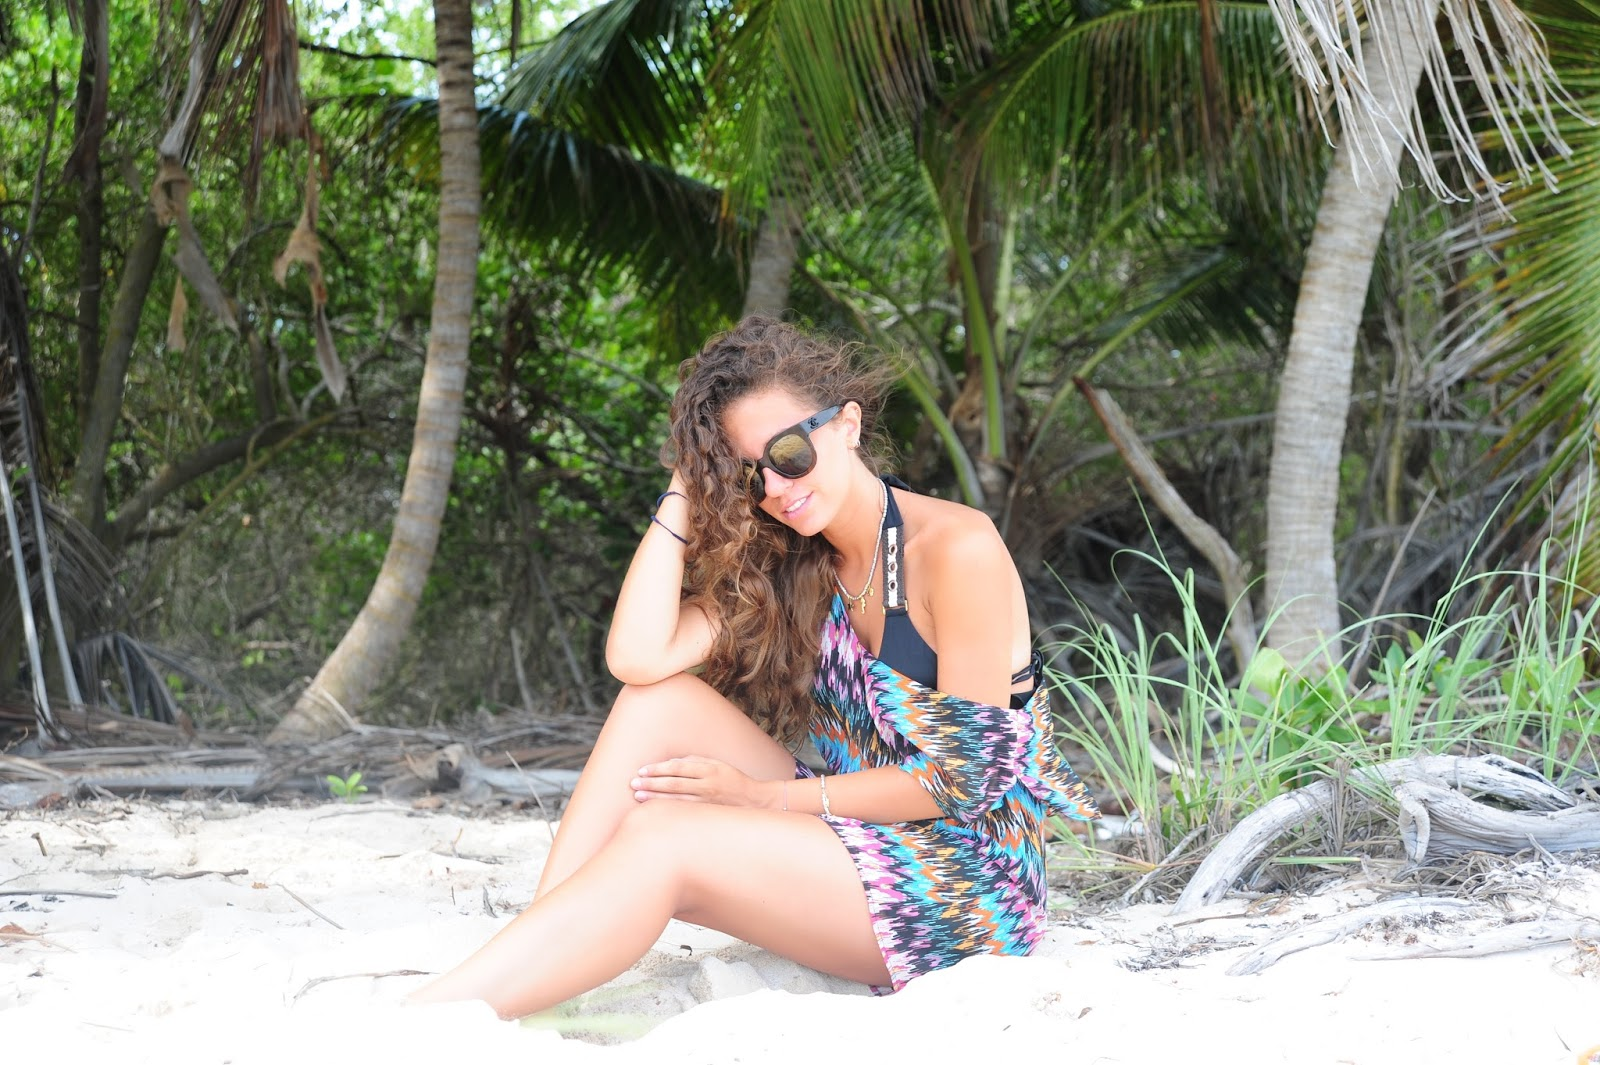 cuba travel diary, 20 days long trip in cuba, cuba travel, traveling in cuba, cuba, cienfuegos, remedios, camaguey, trinidad, santiago, havana, vinales, paradise beach, valentina rago, travel blogger, valentina rago fashion blogger, fashion need, travel blogger advice cuba, travels, where to go in cuba